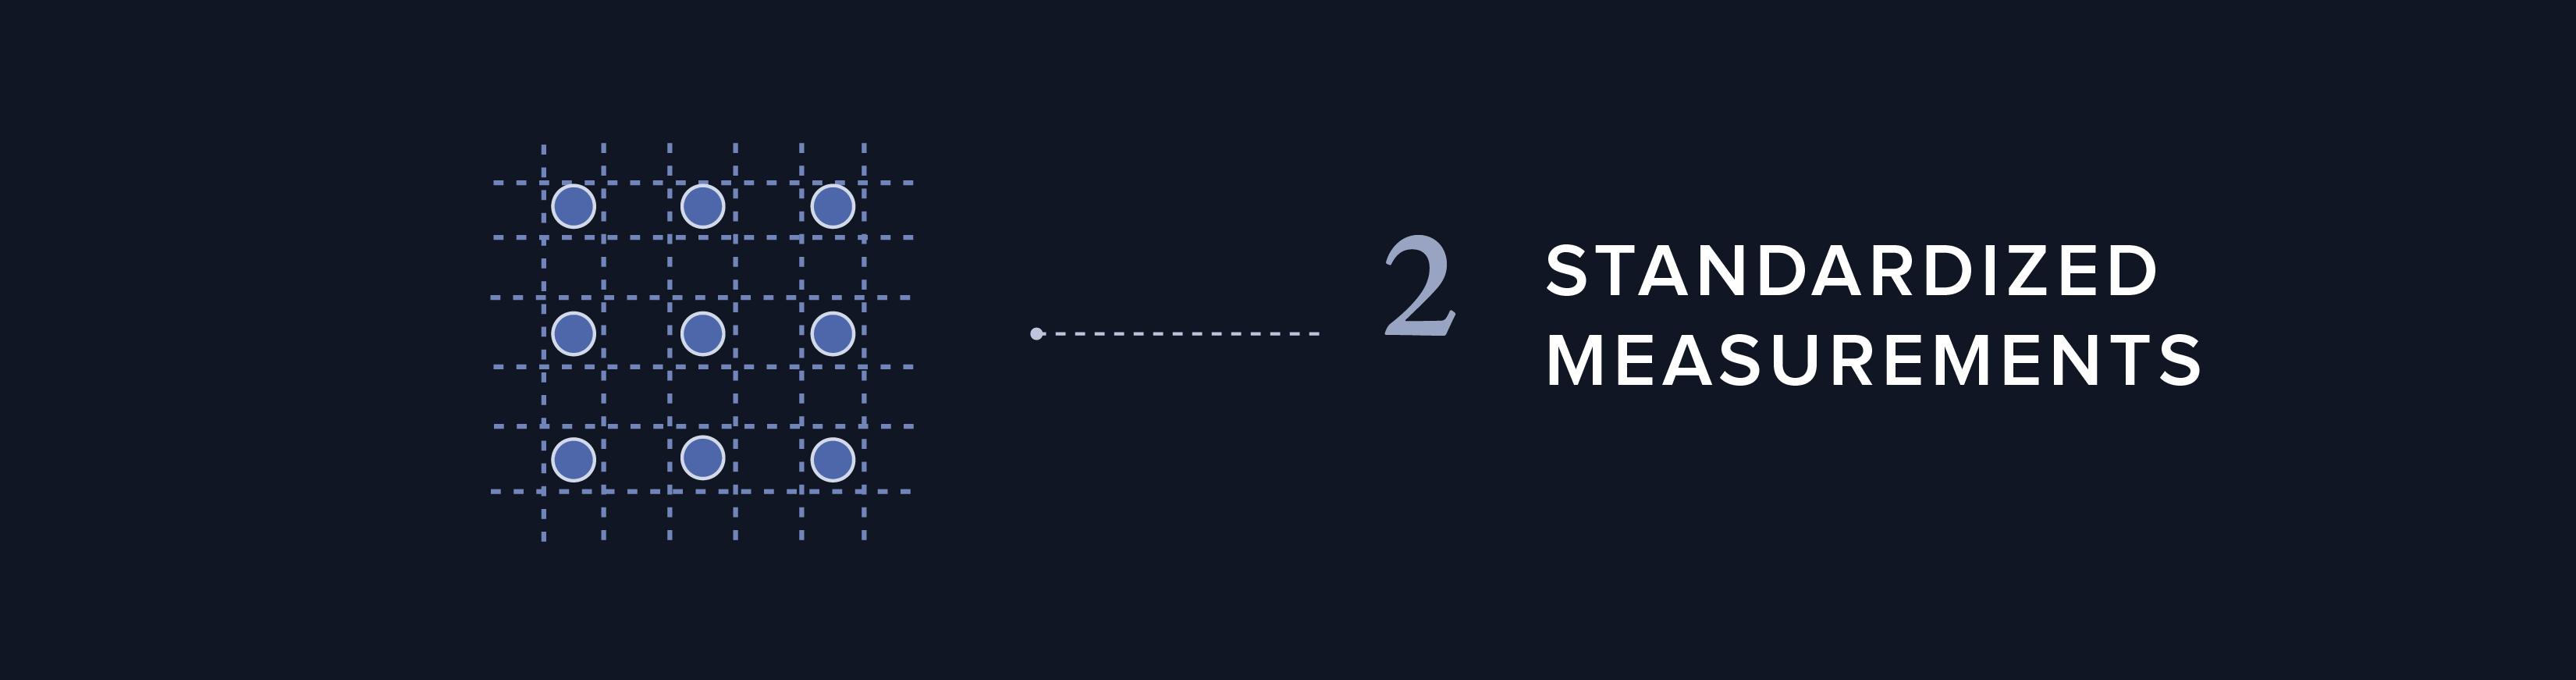 Standardized_Measurements